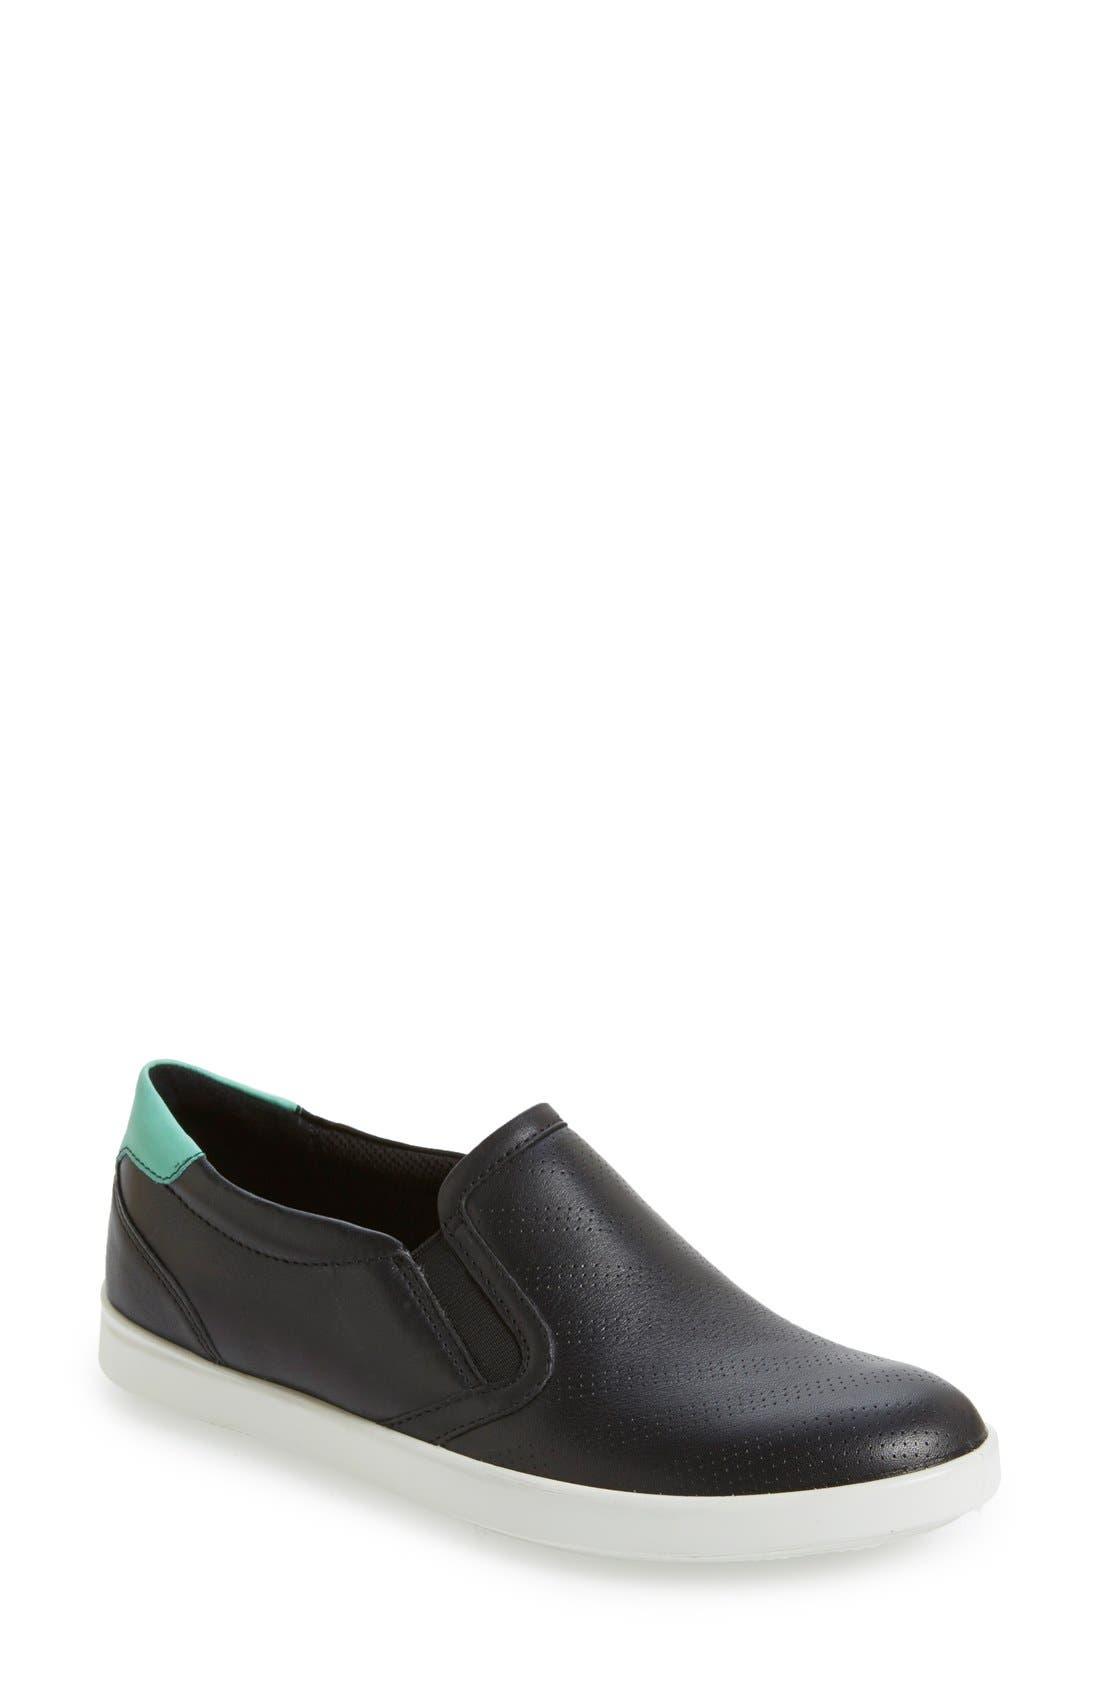 Main Image - ECCO 'Aimee' Slip-On Sneaker (Women)